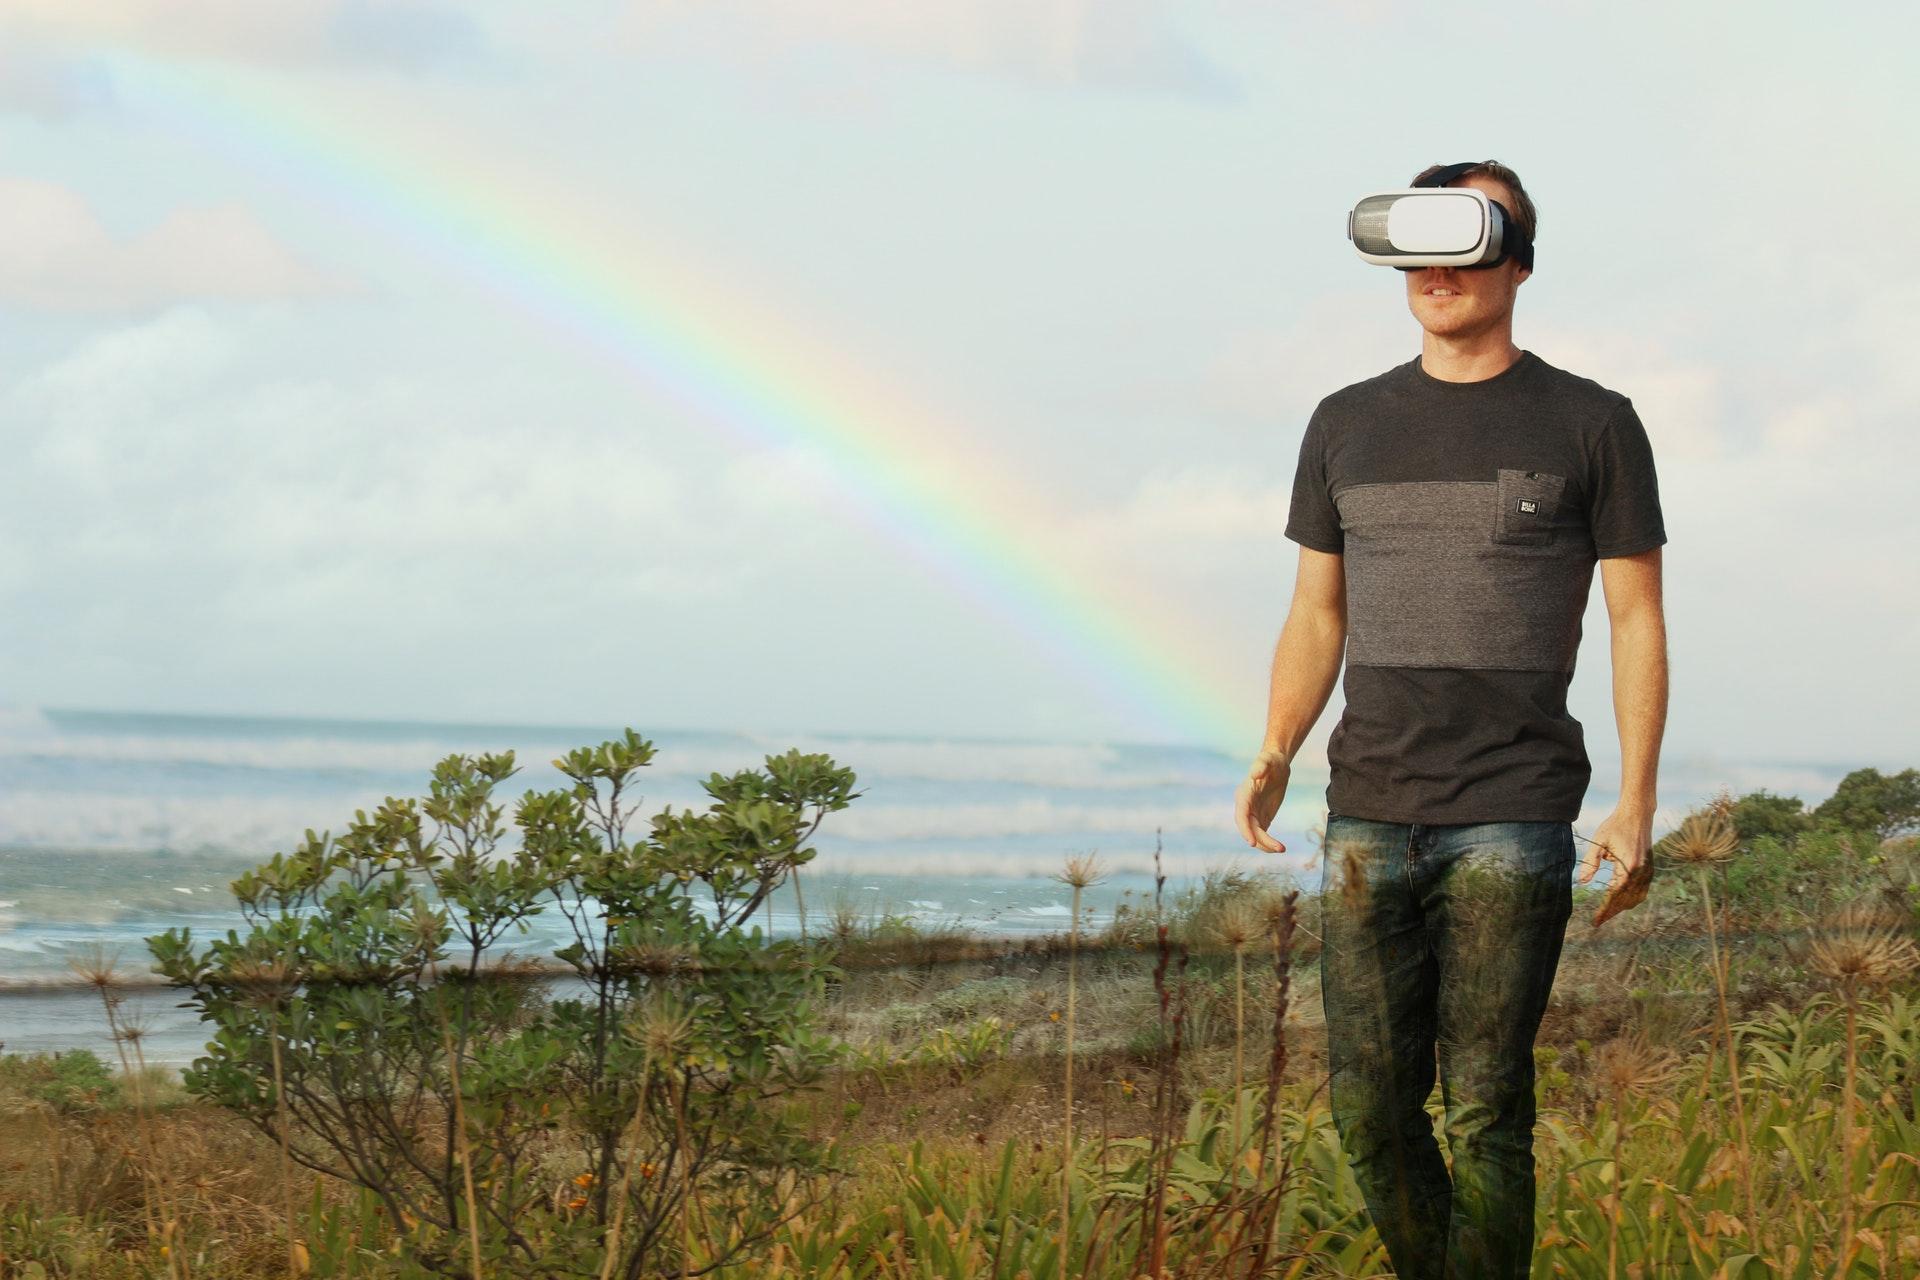 Enhancing technology through human-computer interaction